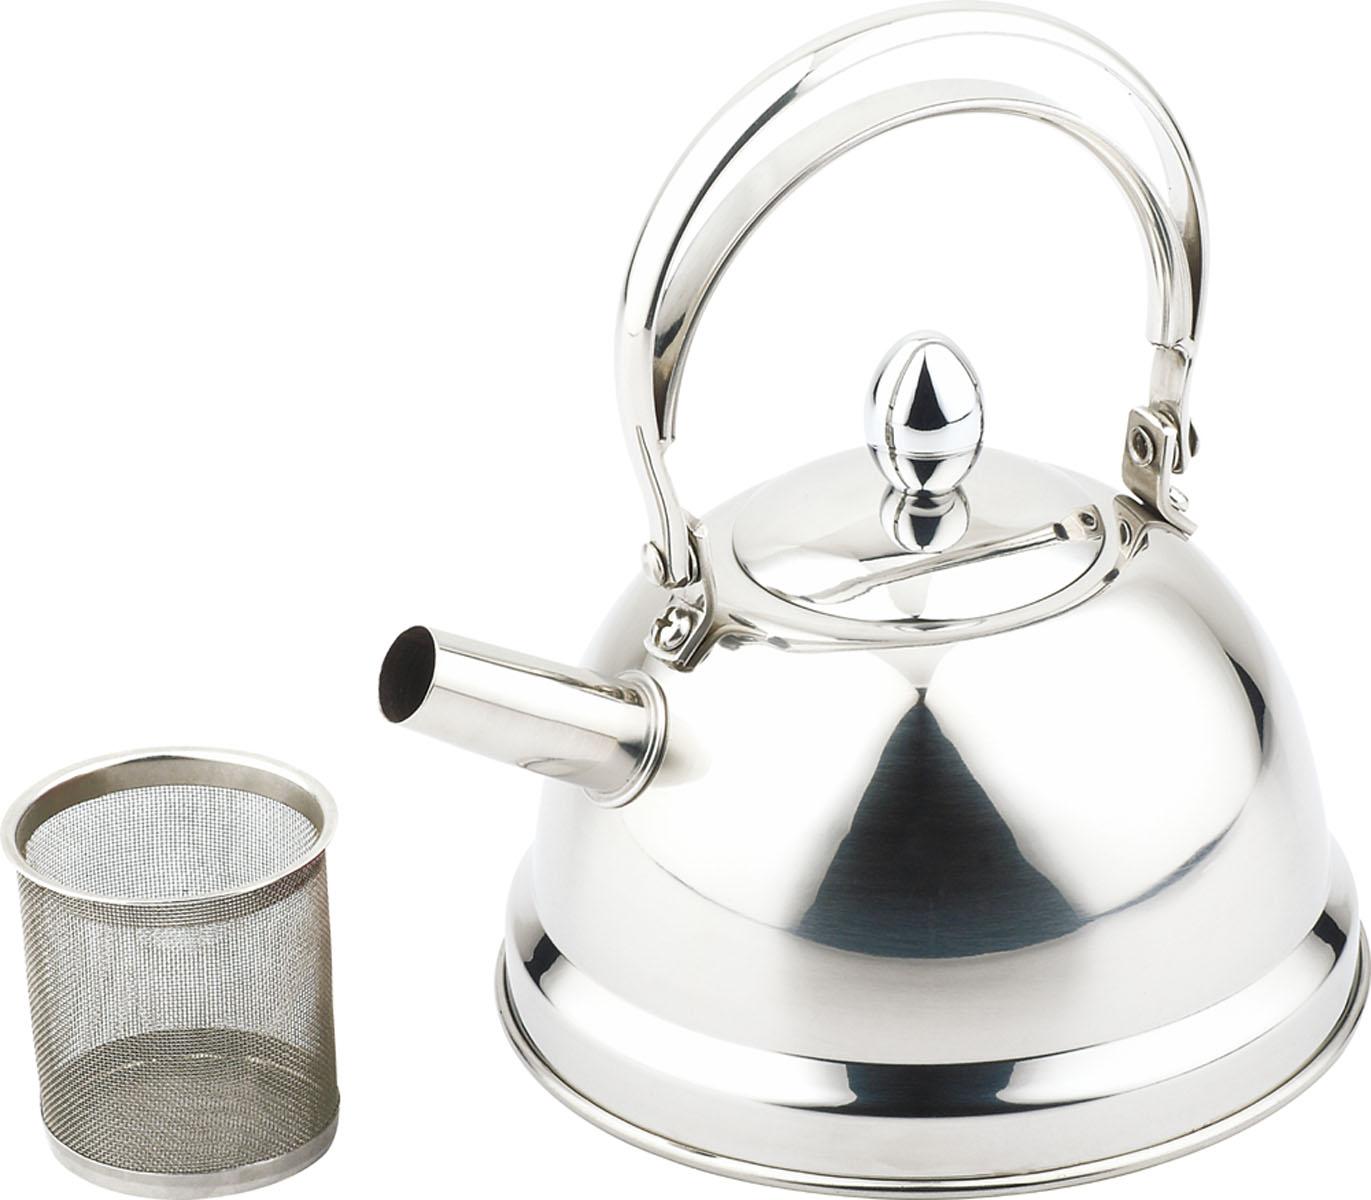 чайник bekker de luxe bk s576 Чайник заварочный Bekker De Luxe, с ситечком, 0,8 л. BK-S441